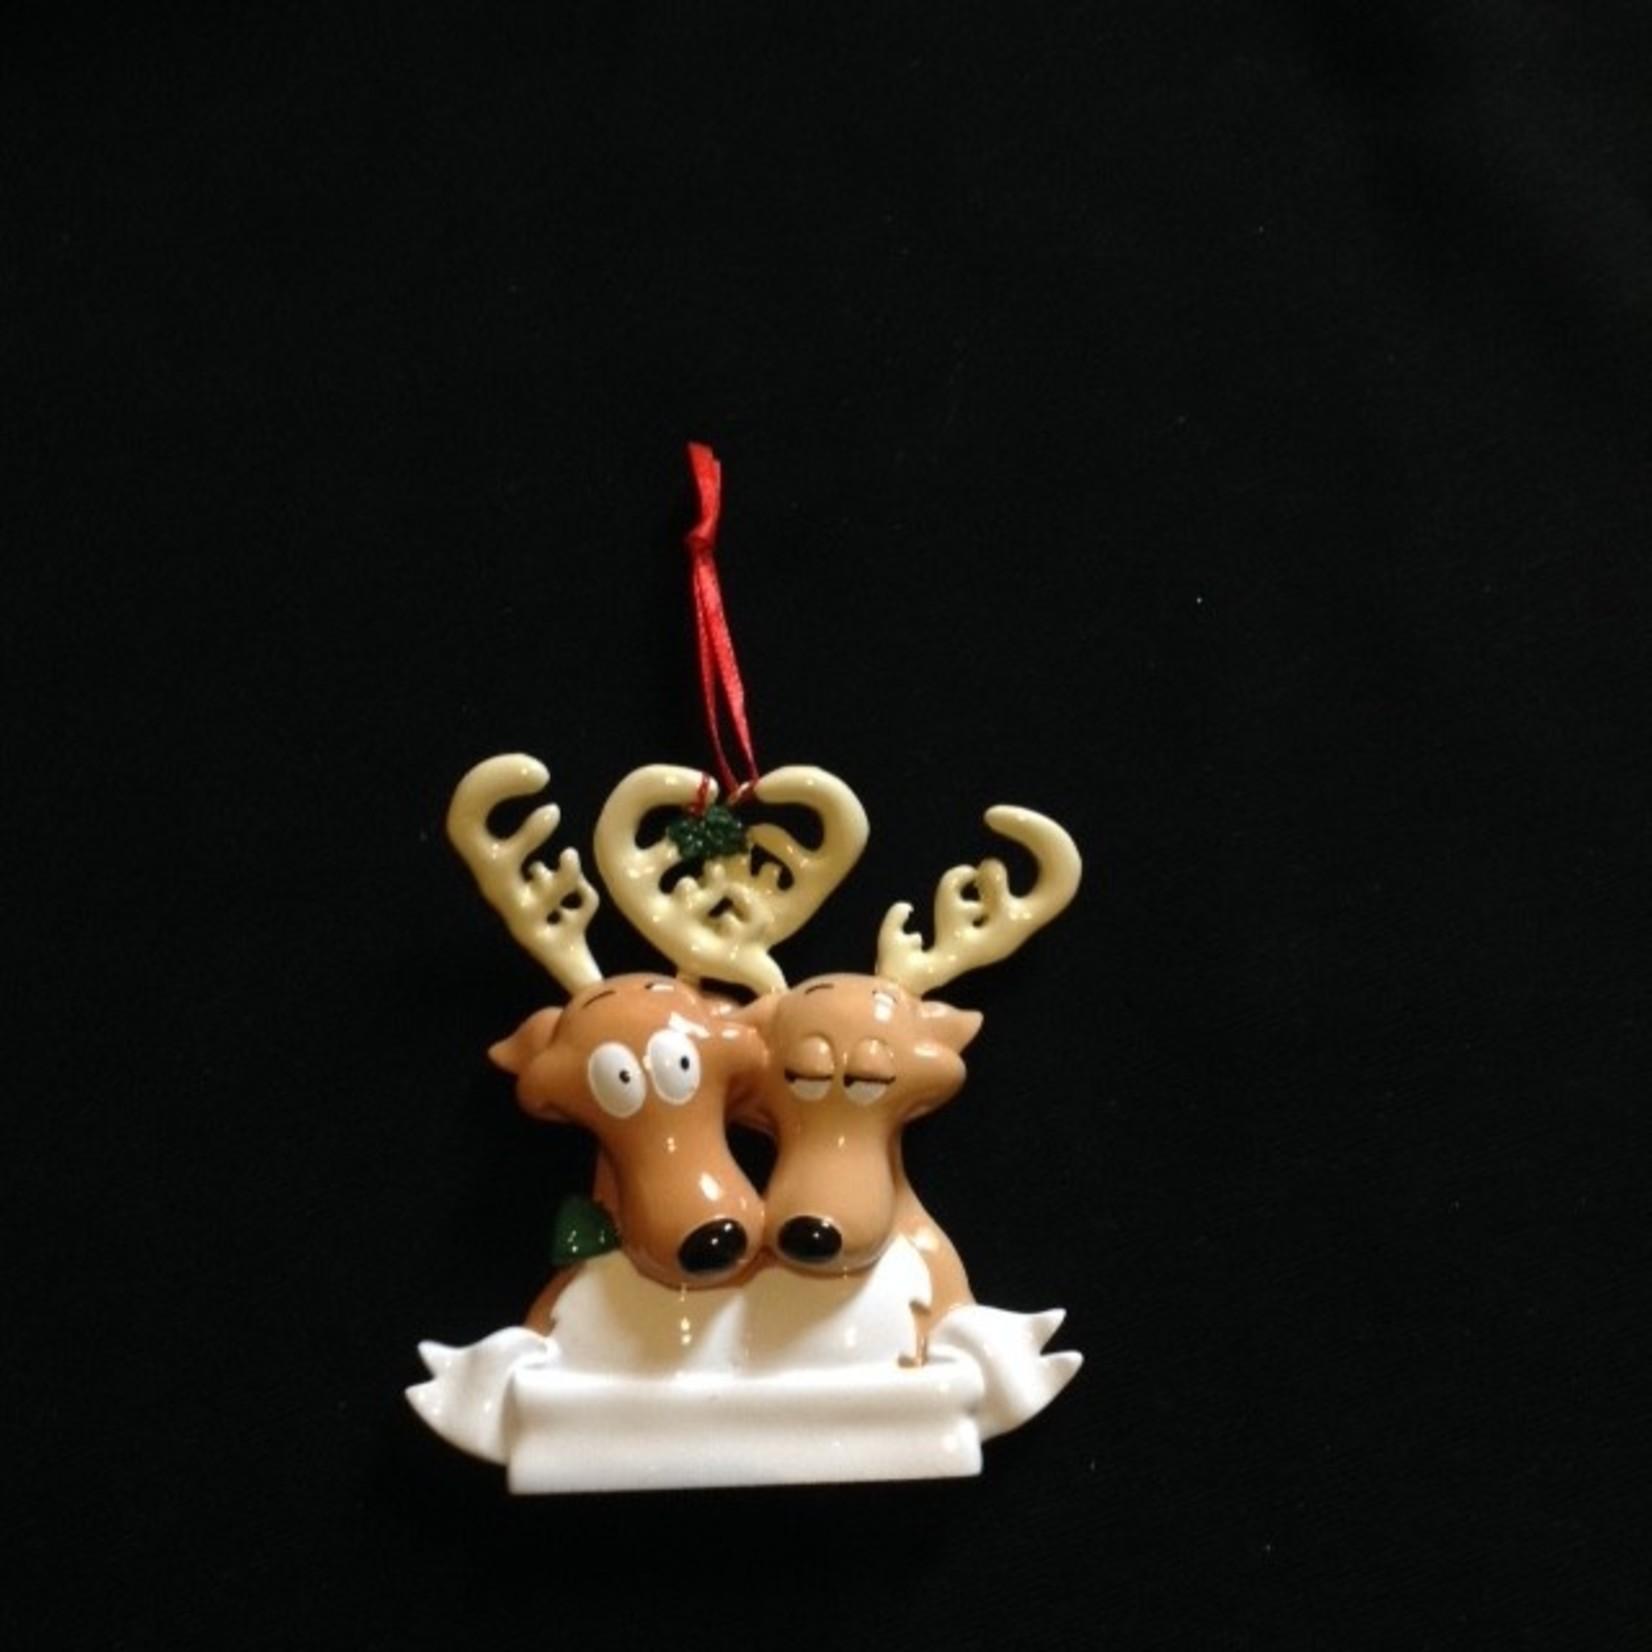 Reindeer Family Orn - 2